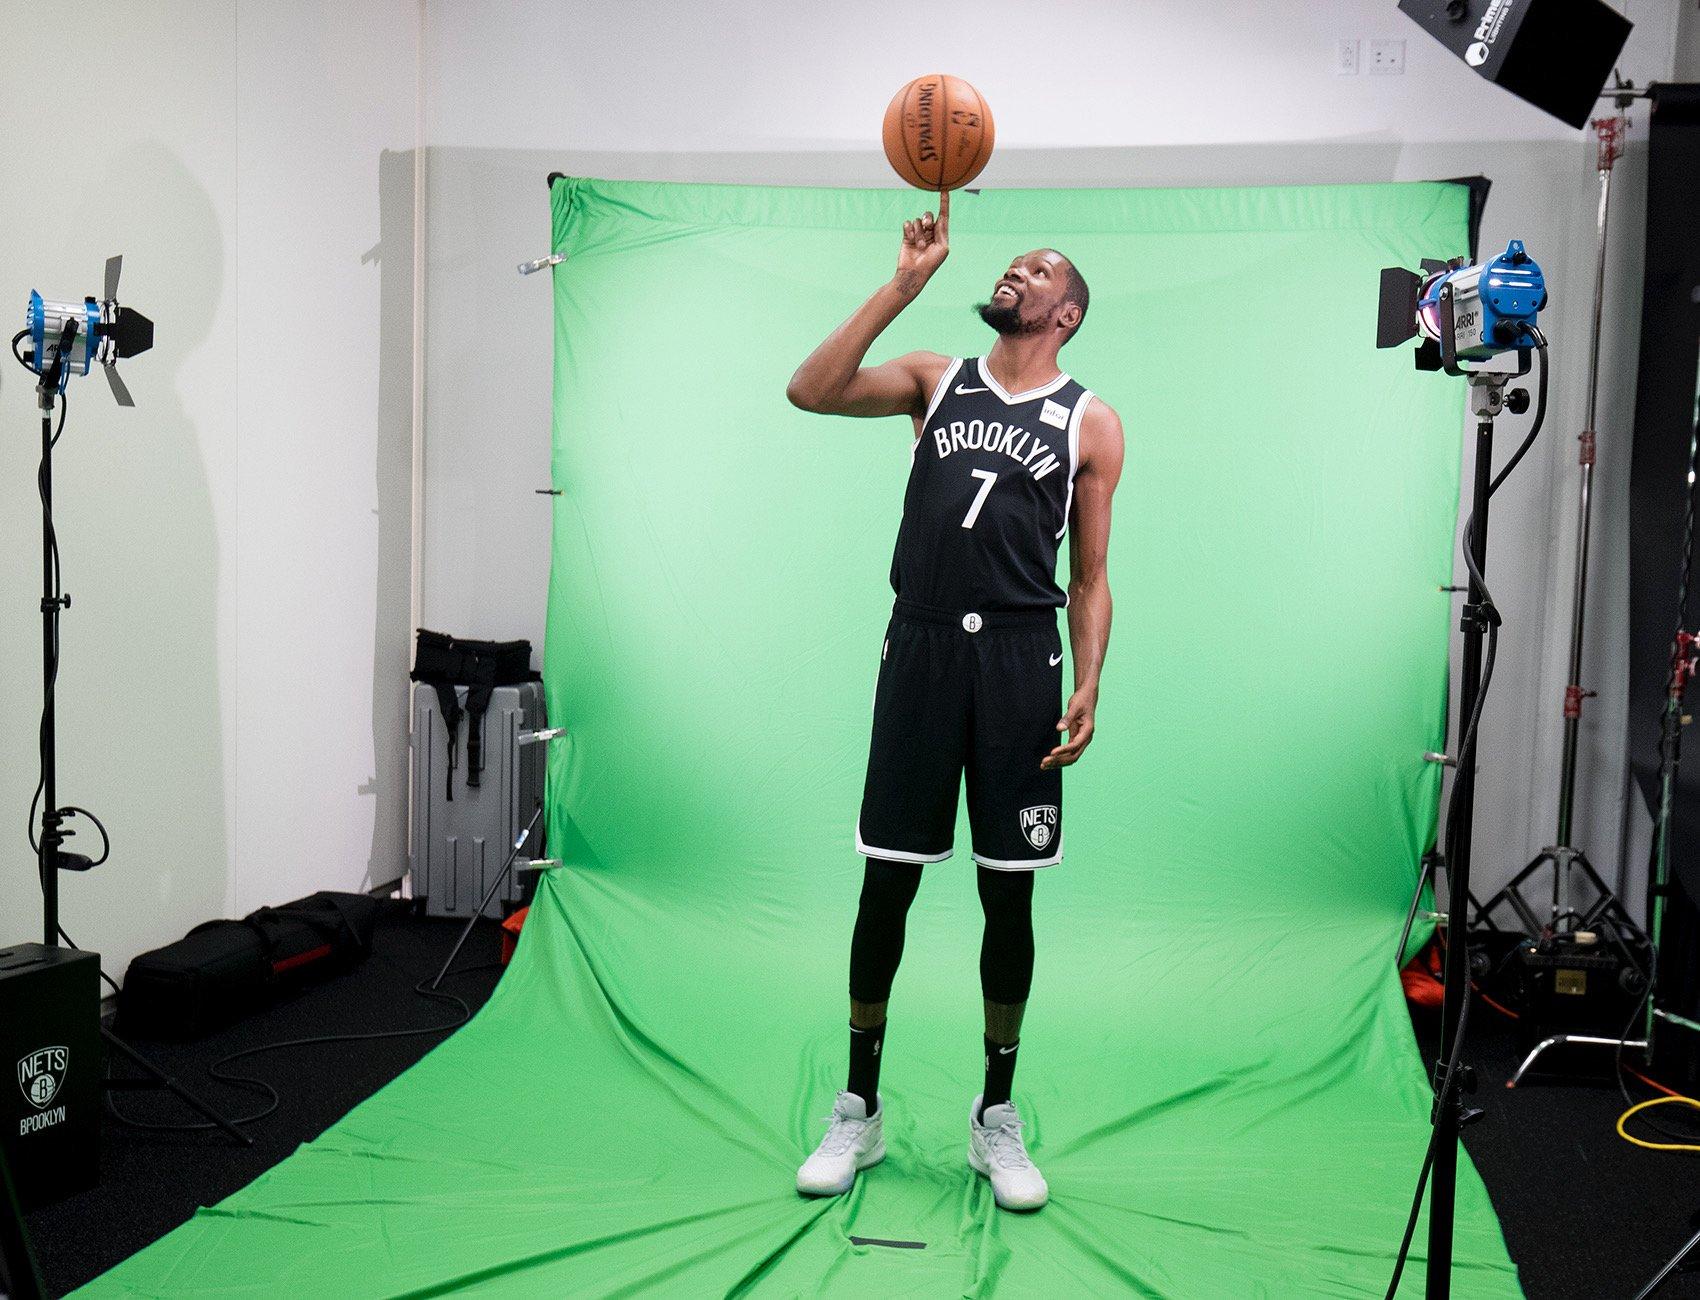 بسکتبال-بروکلین نتس-Basketball-NBA Basketball